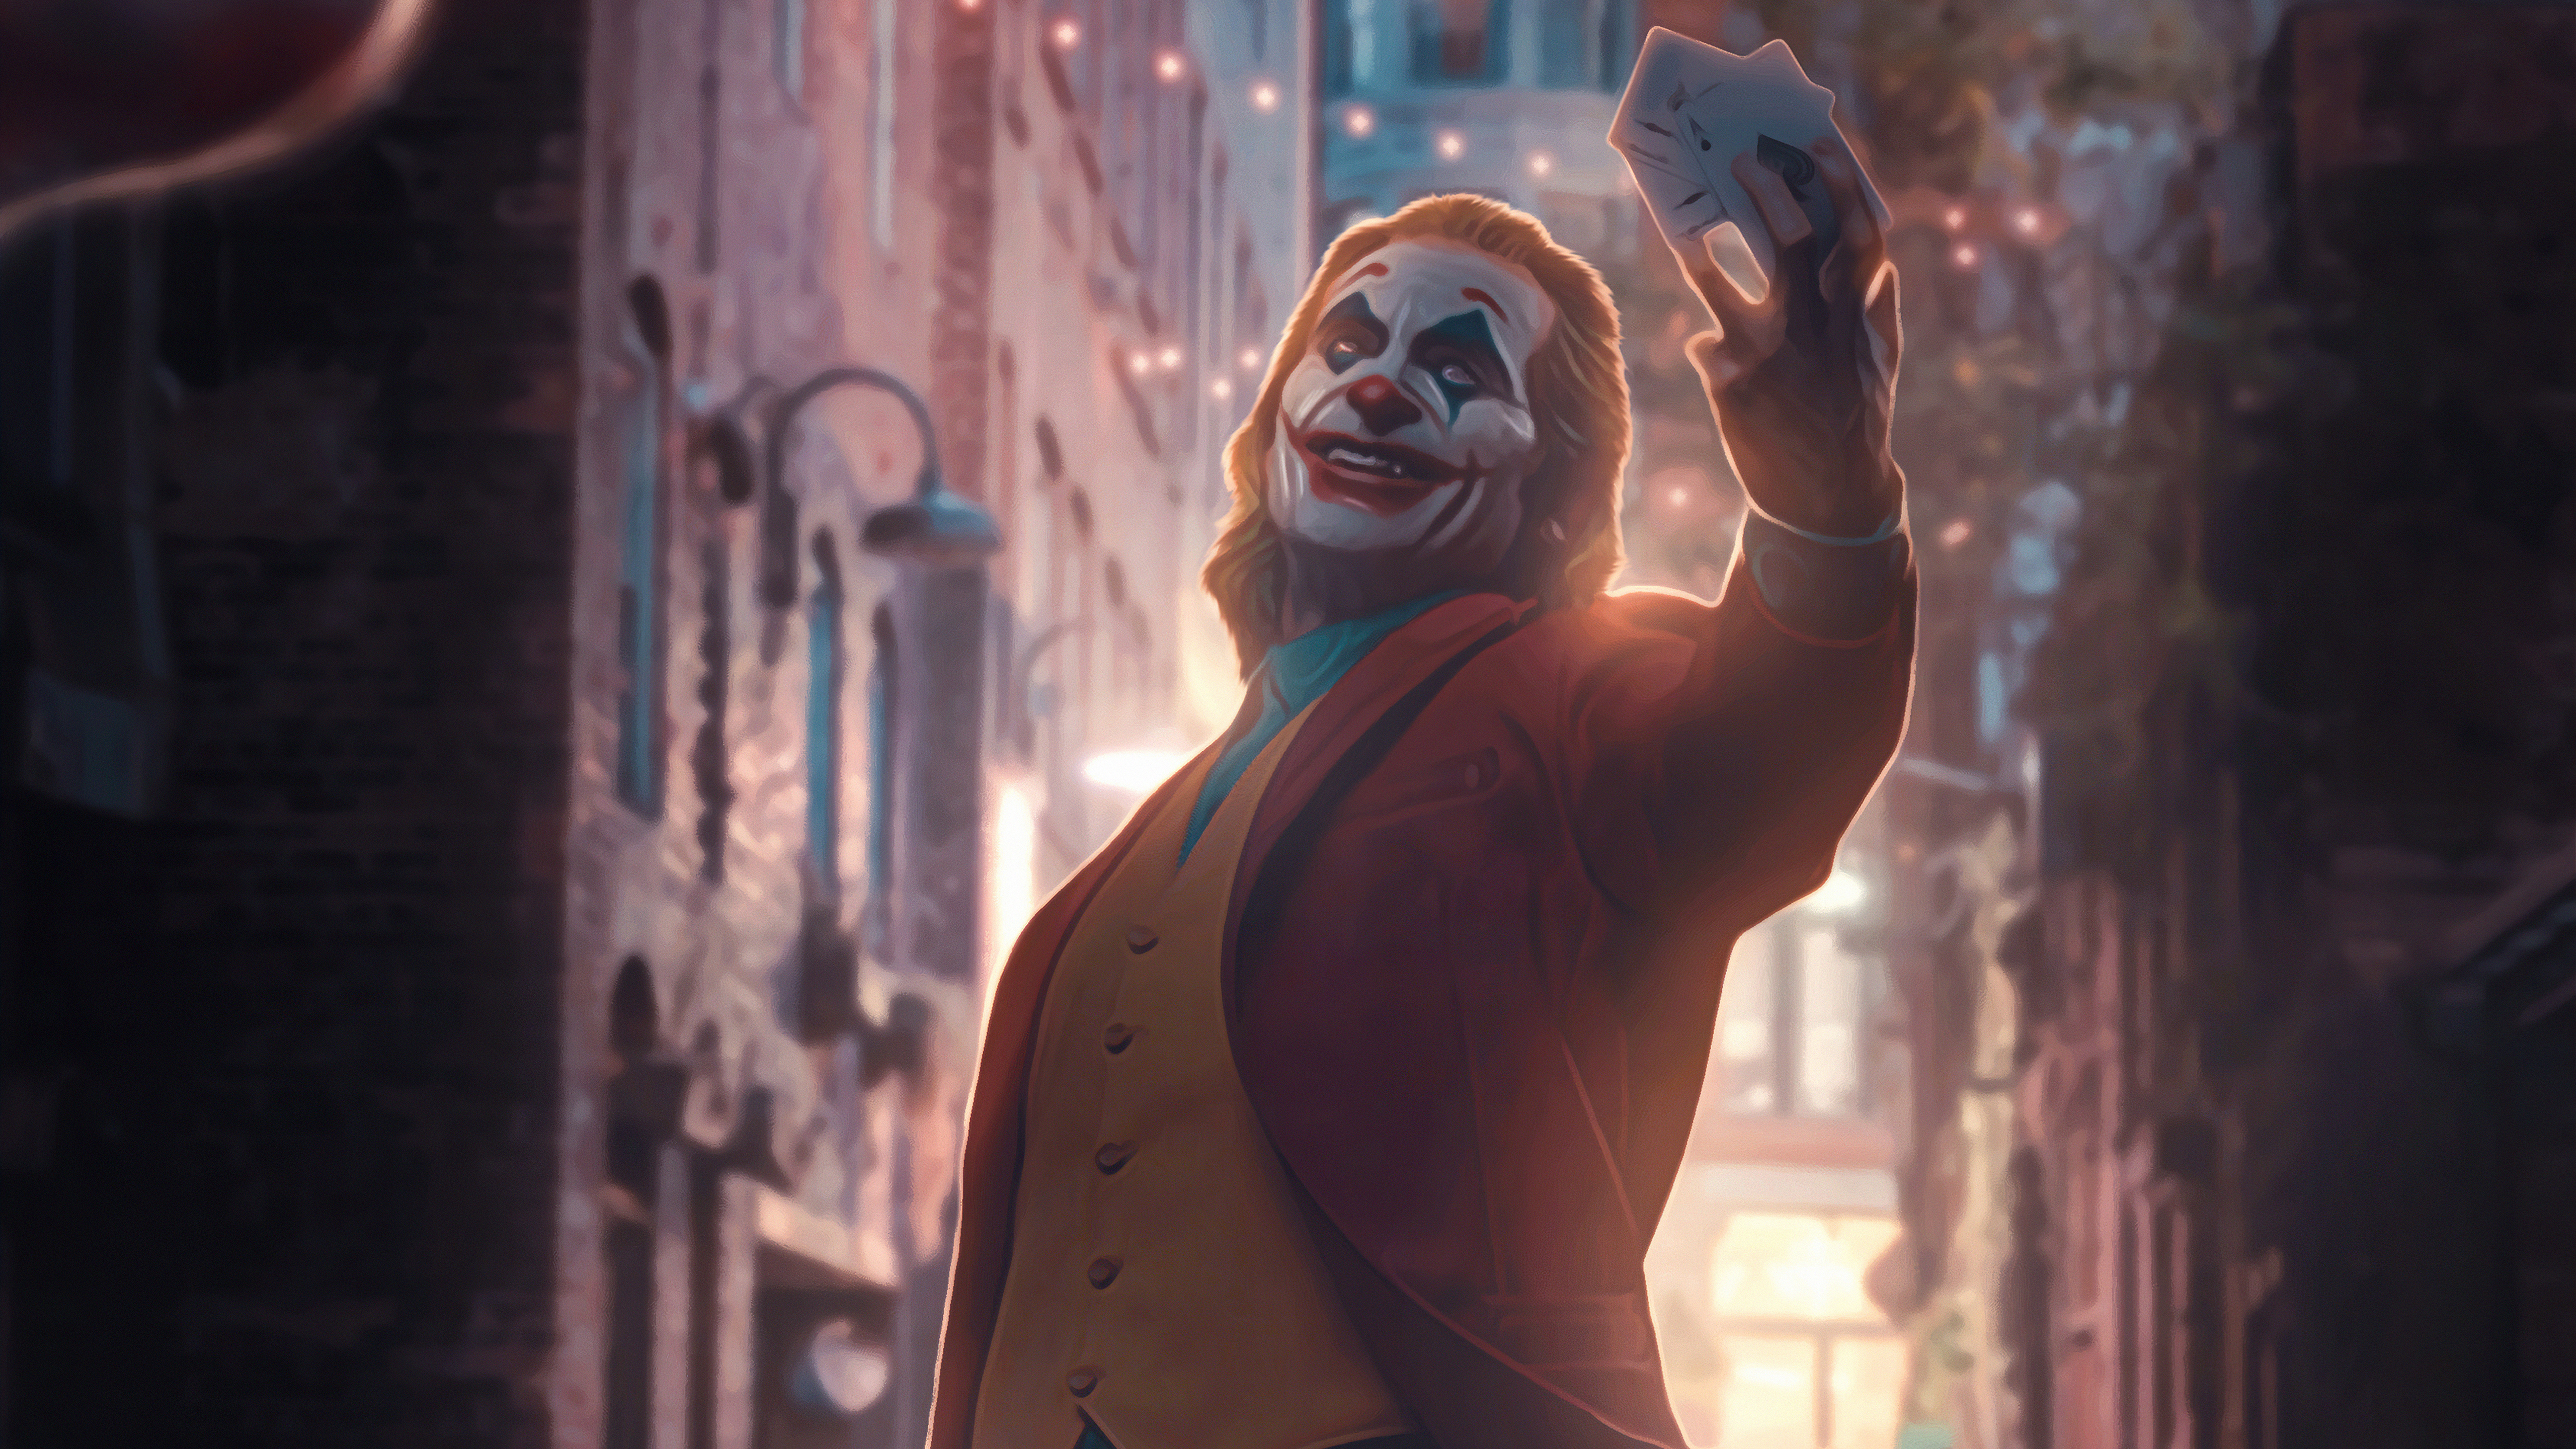 Wallpaper Joker with cards